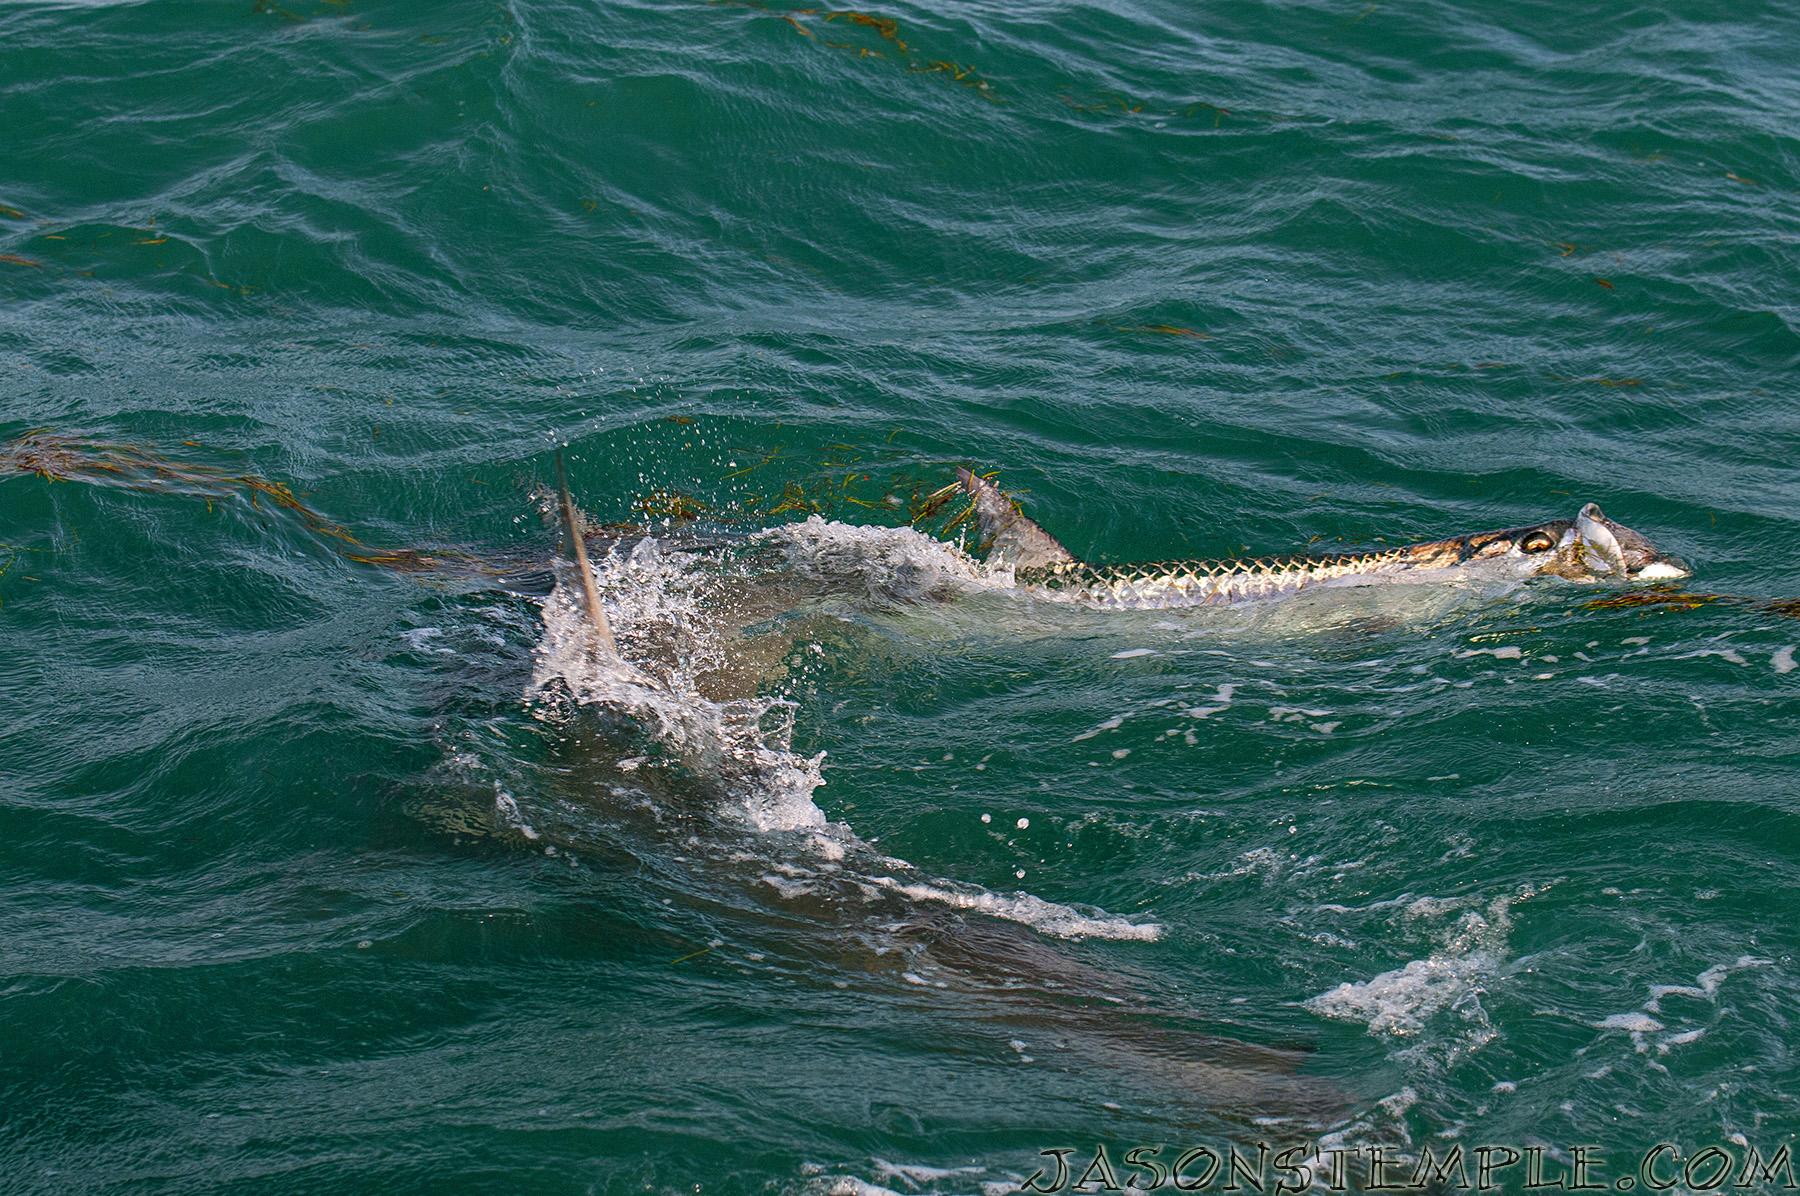 Hammerhead Shark eating a tarpon at Bahia Honda NIKON D300S, 70MM, F/5.0, 1/800 SEC